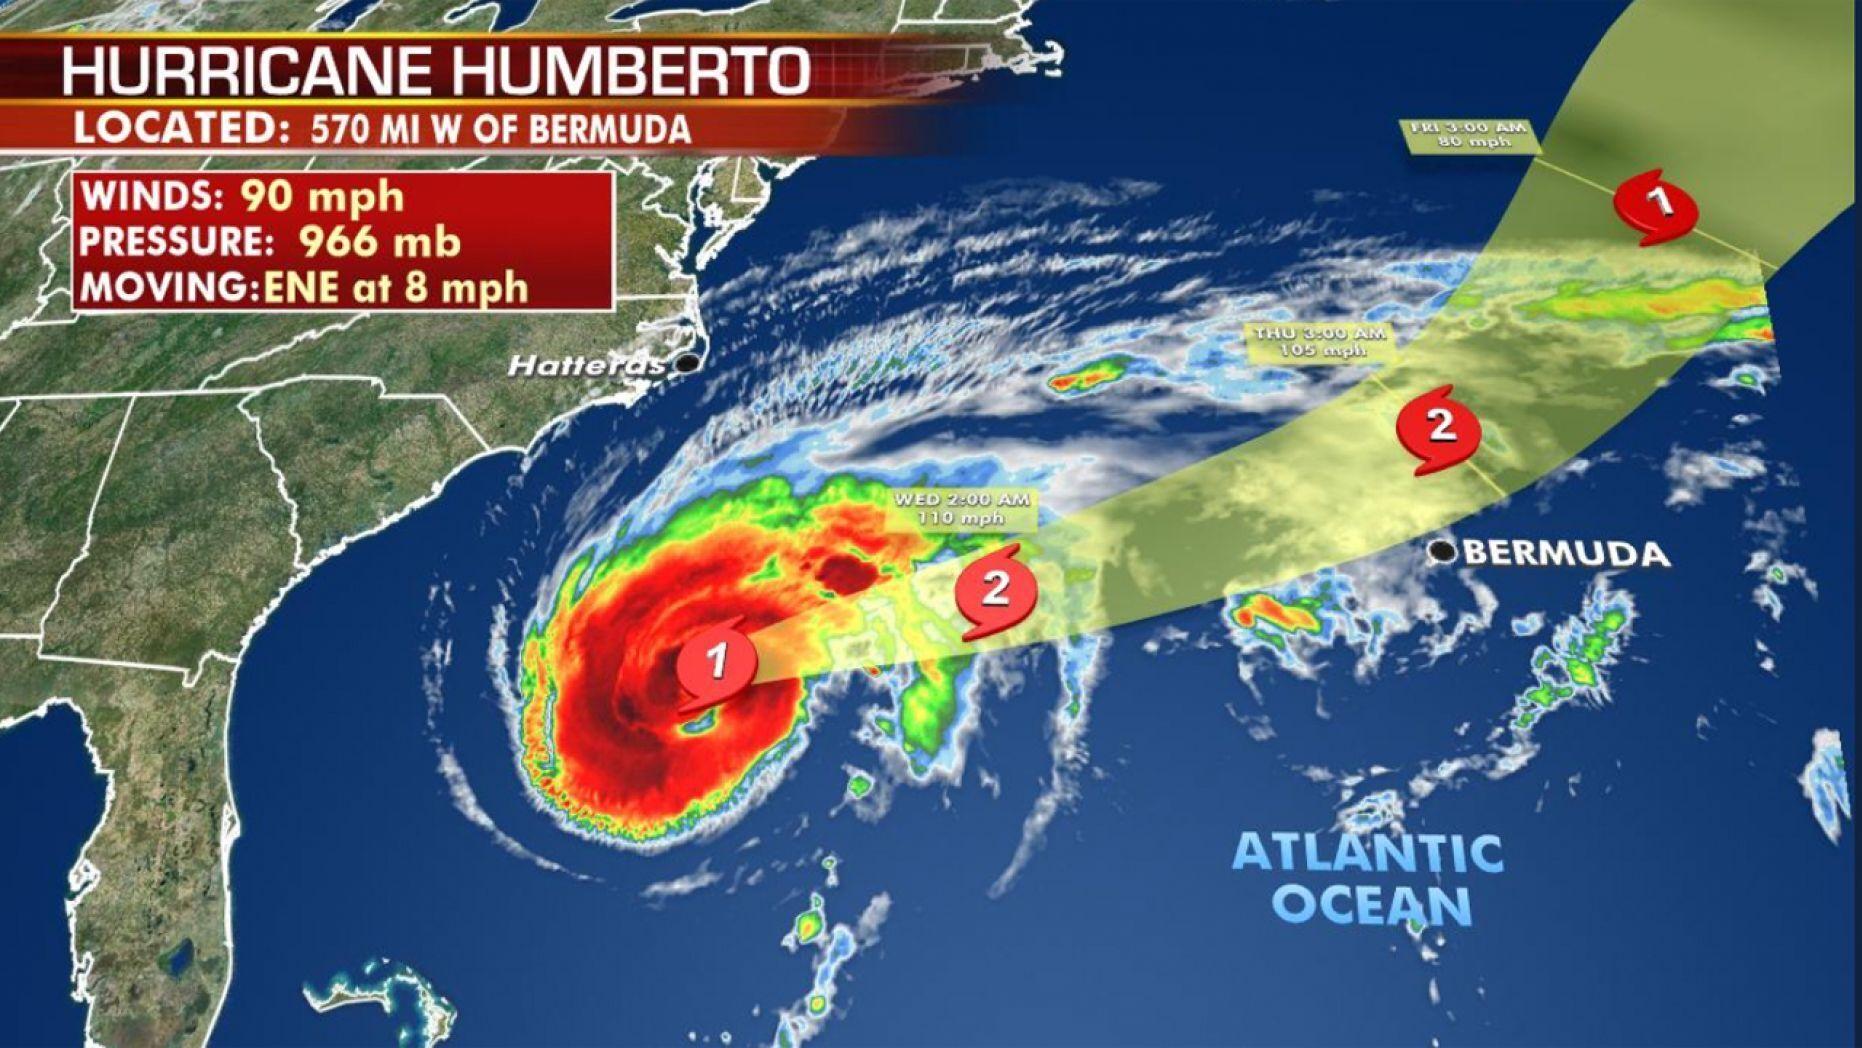 Hurricane Humberto Hurricane Season Hurricane National Hurricane Center